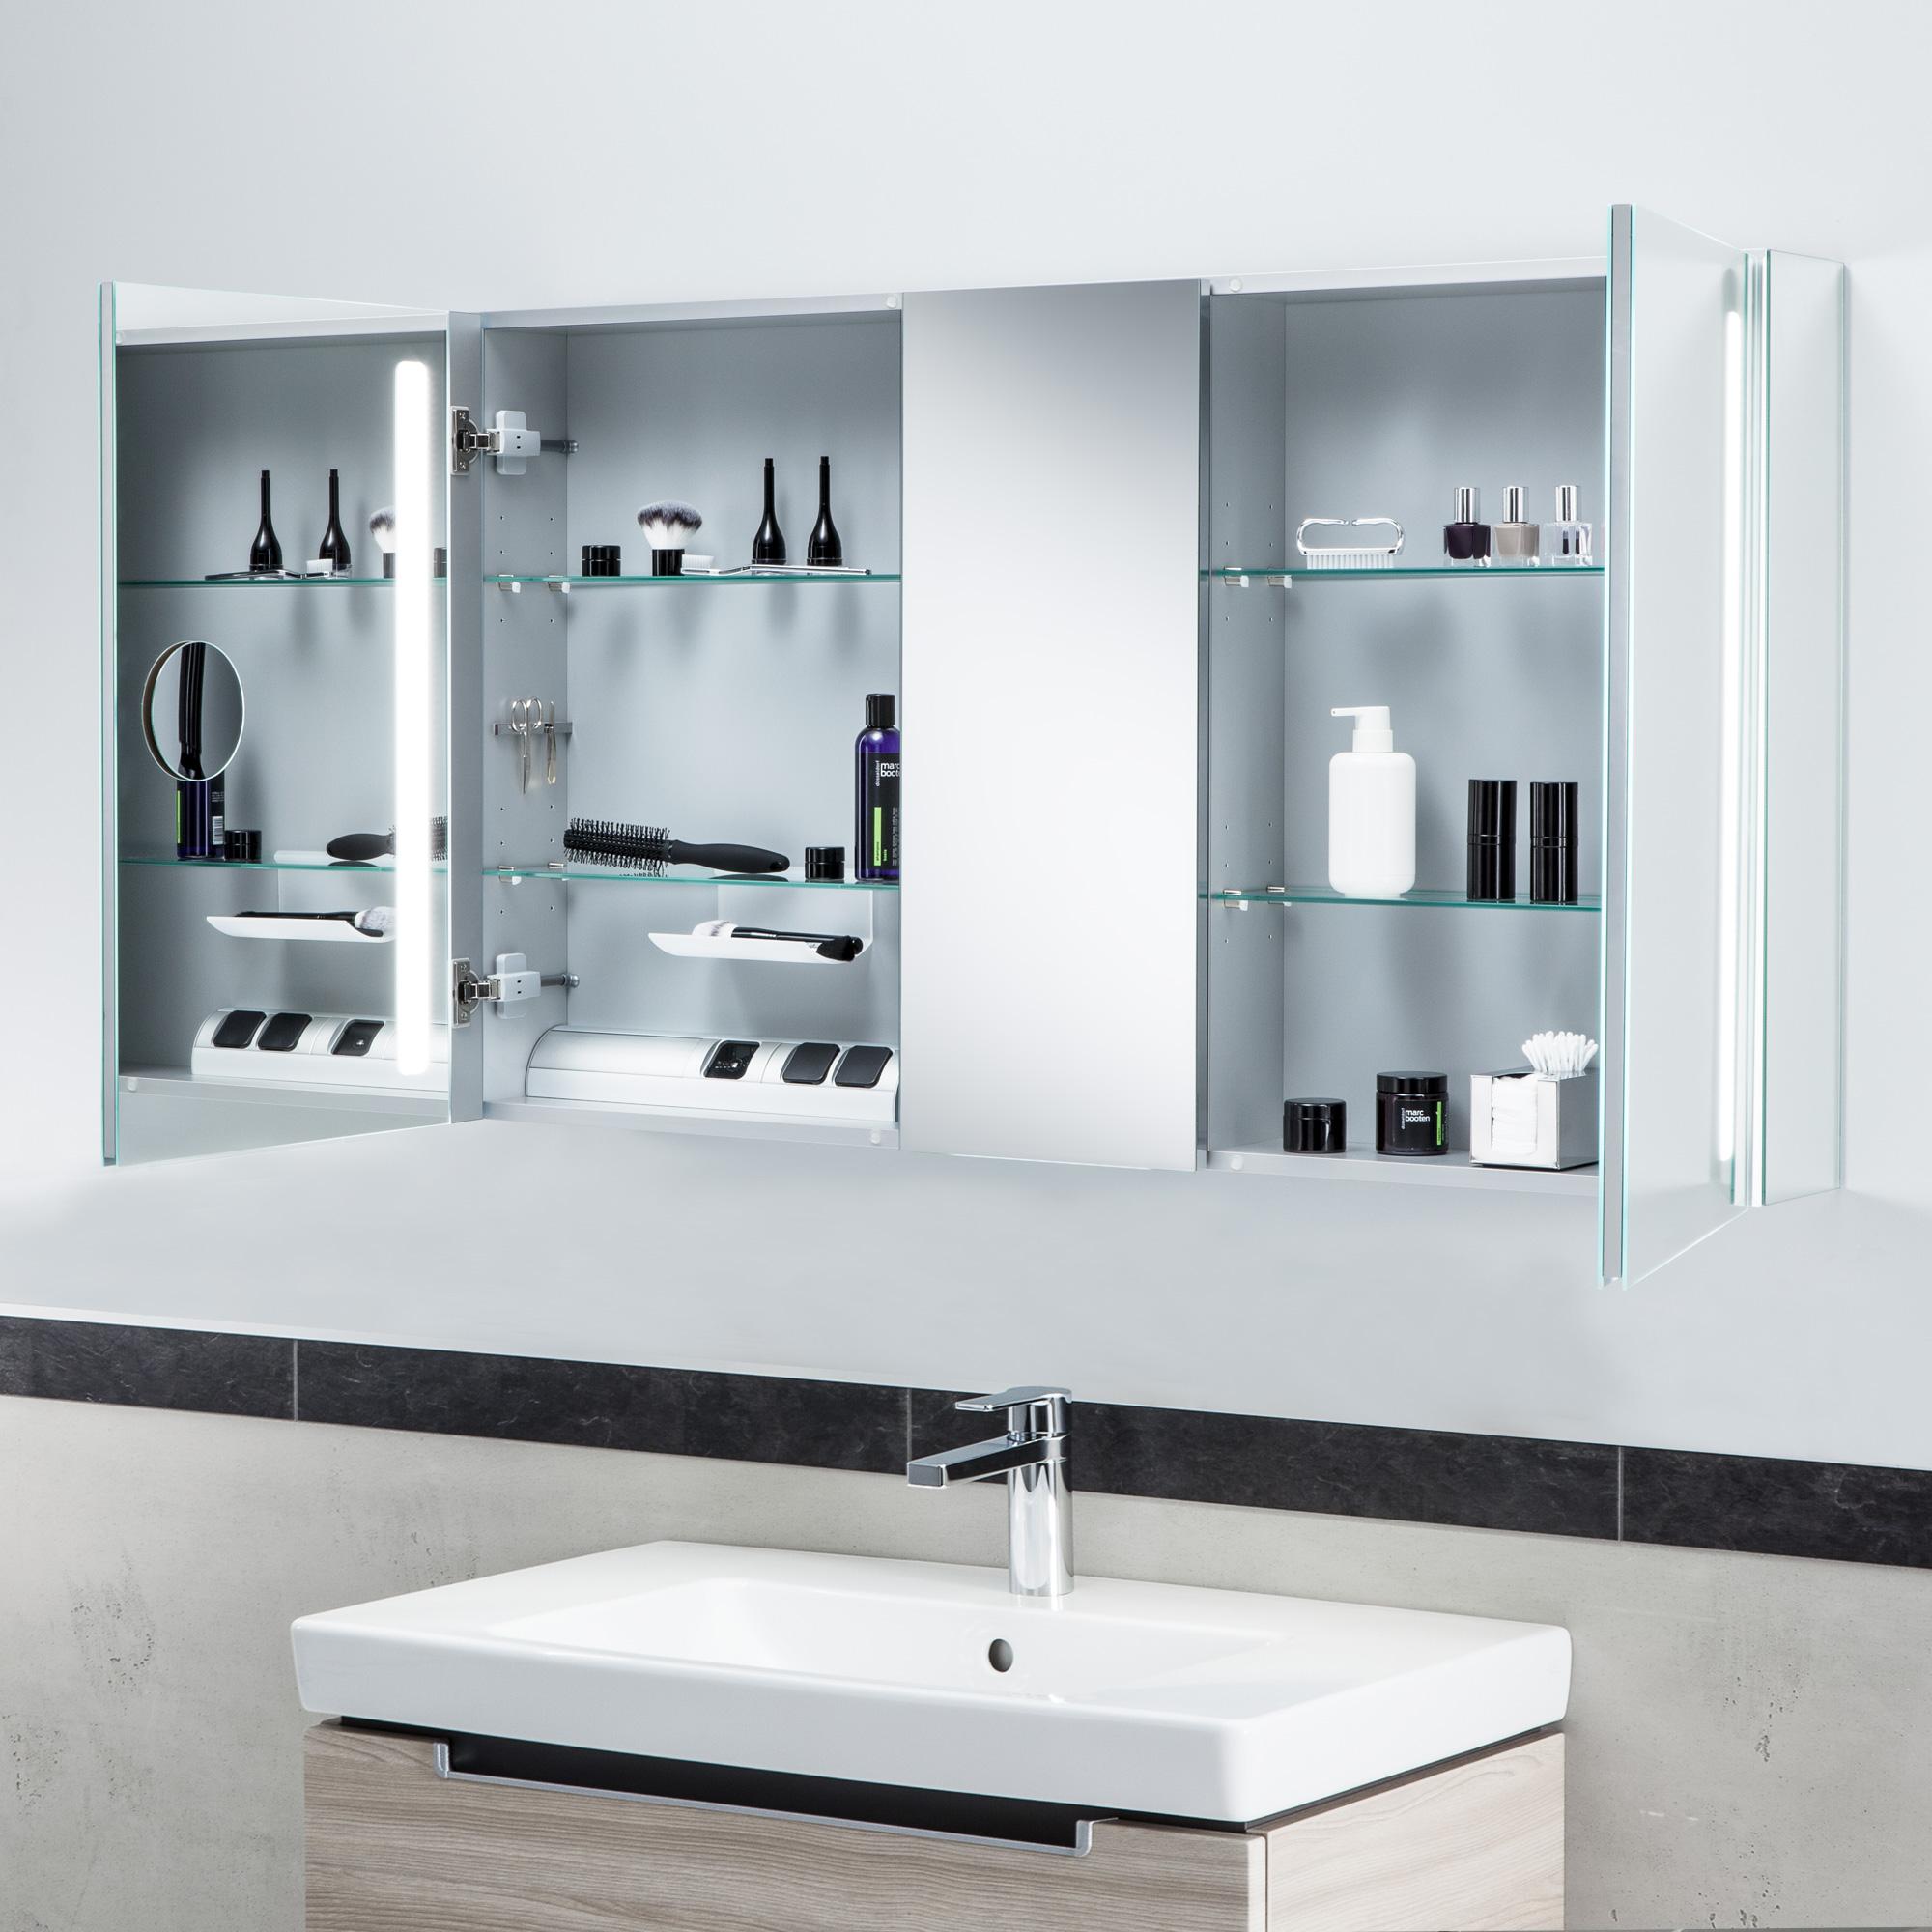 villeroy boch my view 14 spiegelschrank mit led beleuchtung dimmbar a4241300 reuter. Black Bedroom Furniture Sets. Home Design Ideas